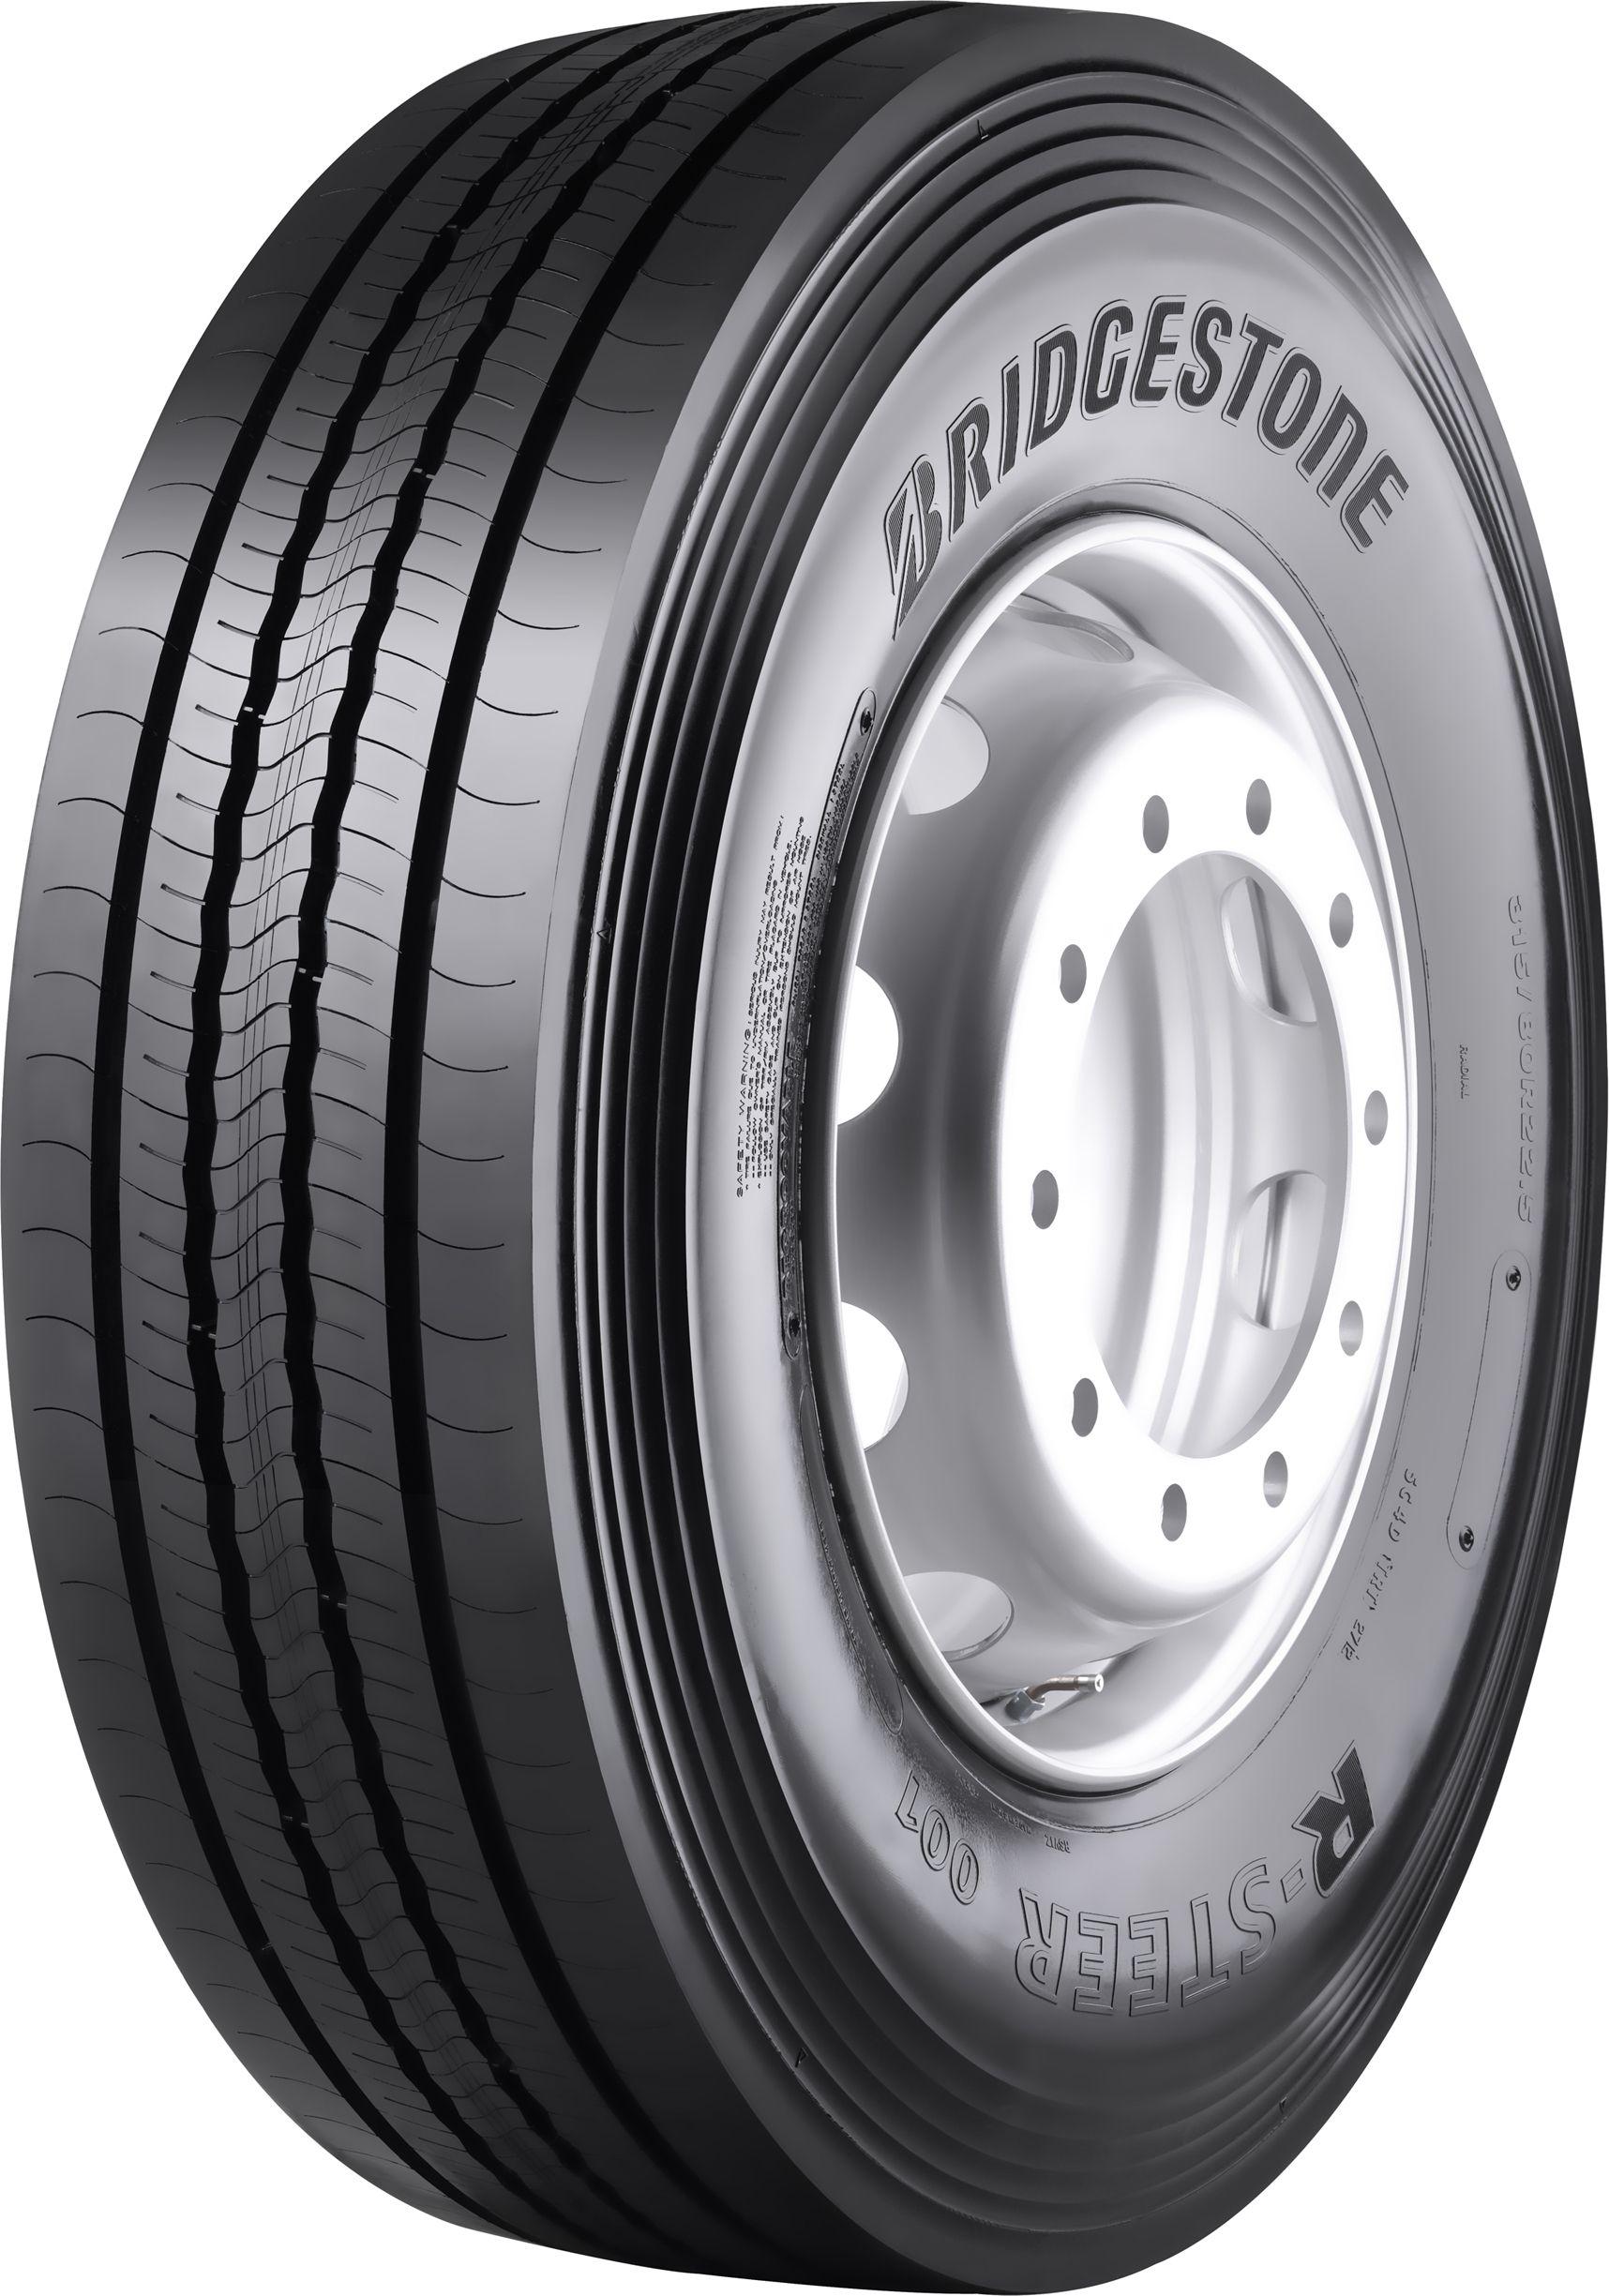 Bridgestone 315/70R22.5 R-Steer 001 (M+S) 156/150 (154/150)L(M)